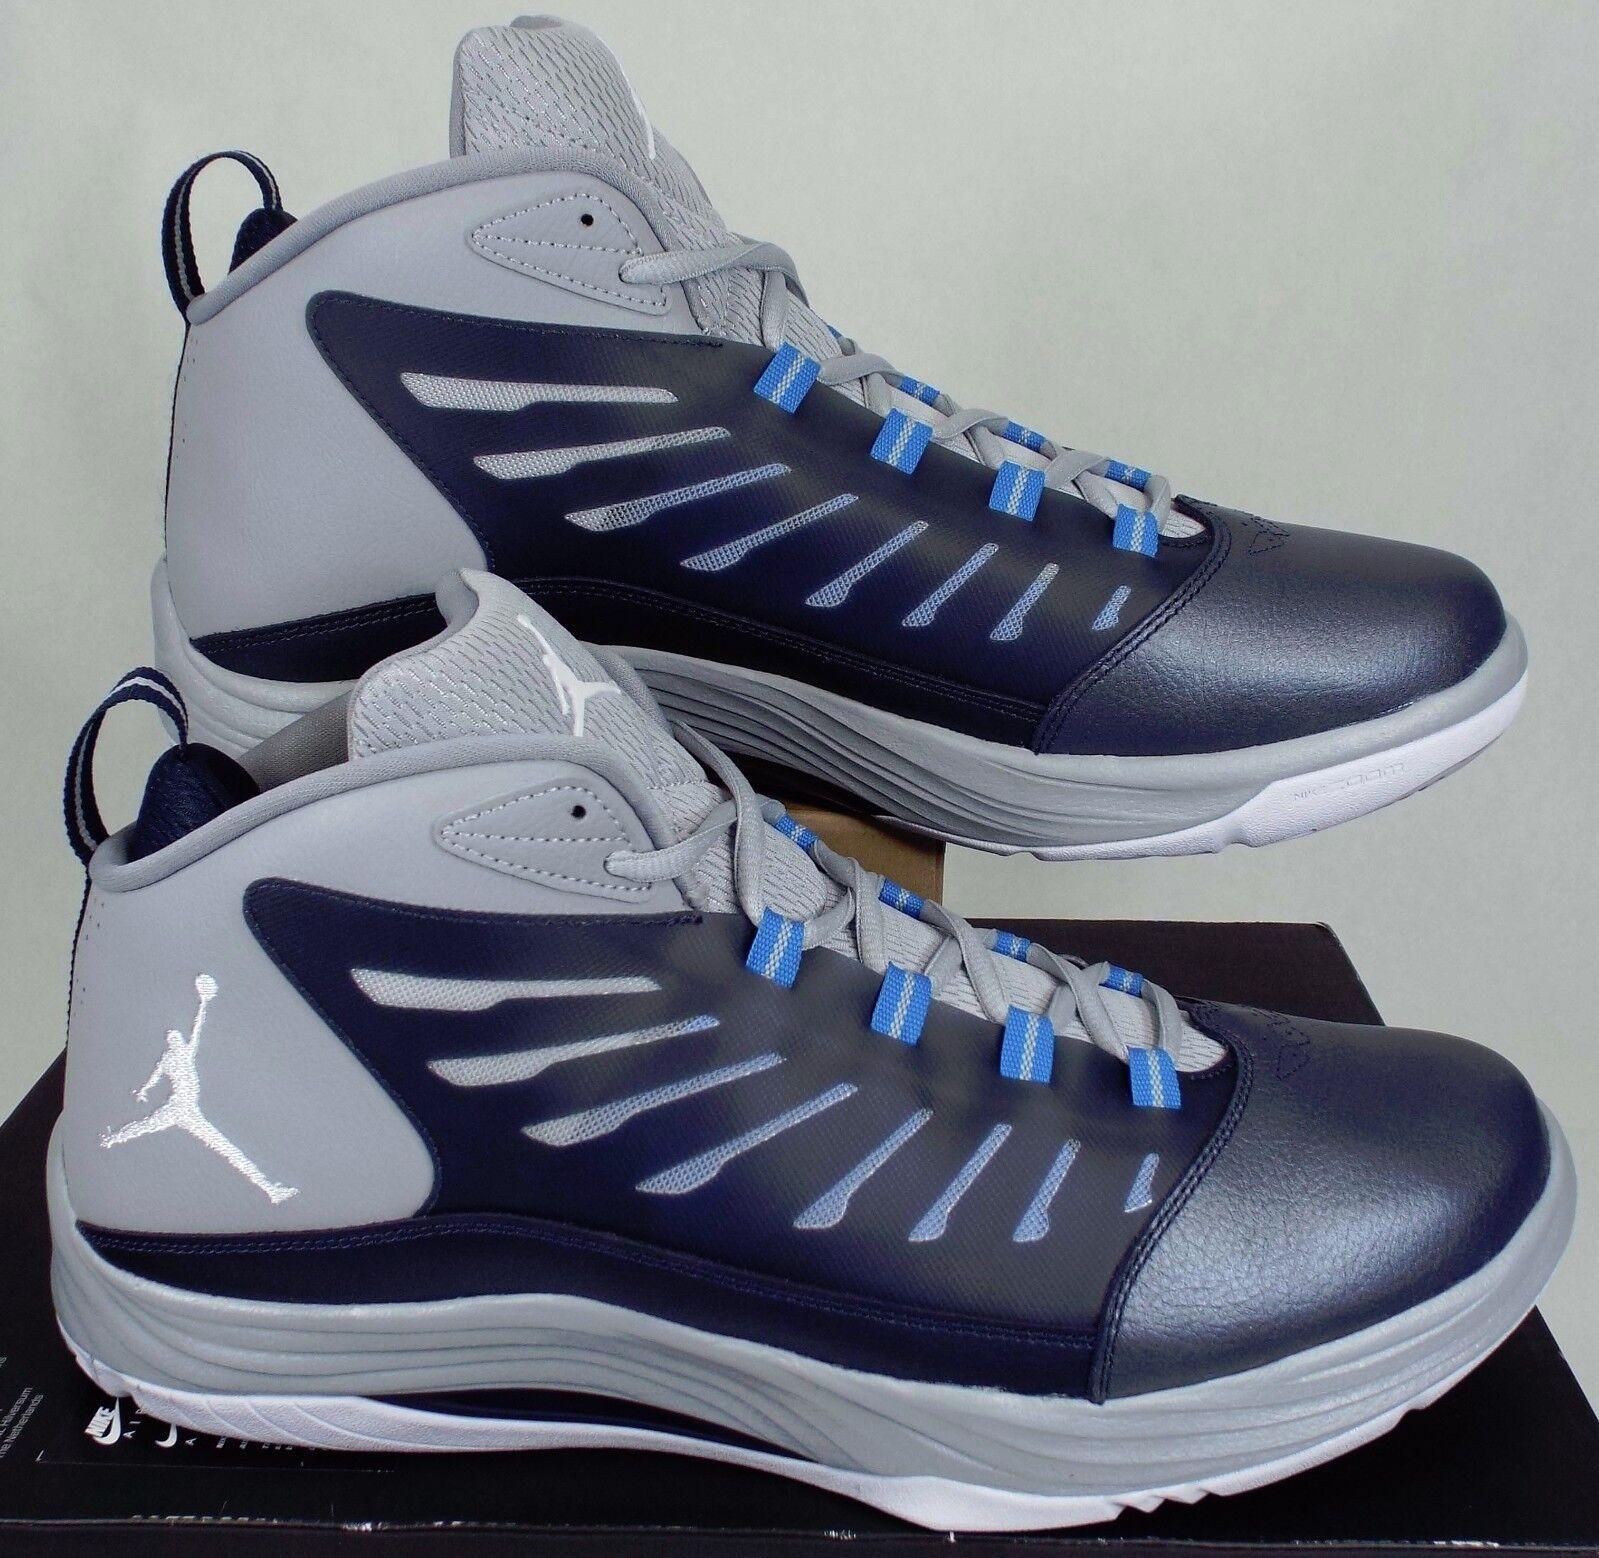 New Mens 16 NIKE Jordan PrimeFly Shoes 2 Navy Grey Basketball Shoes PrimeFly 120 654287-407 607943